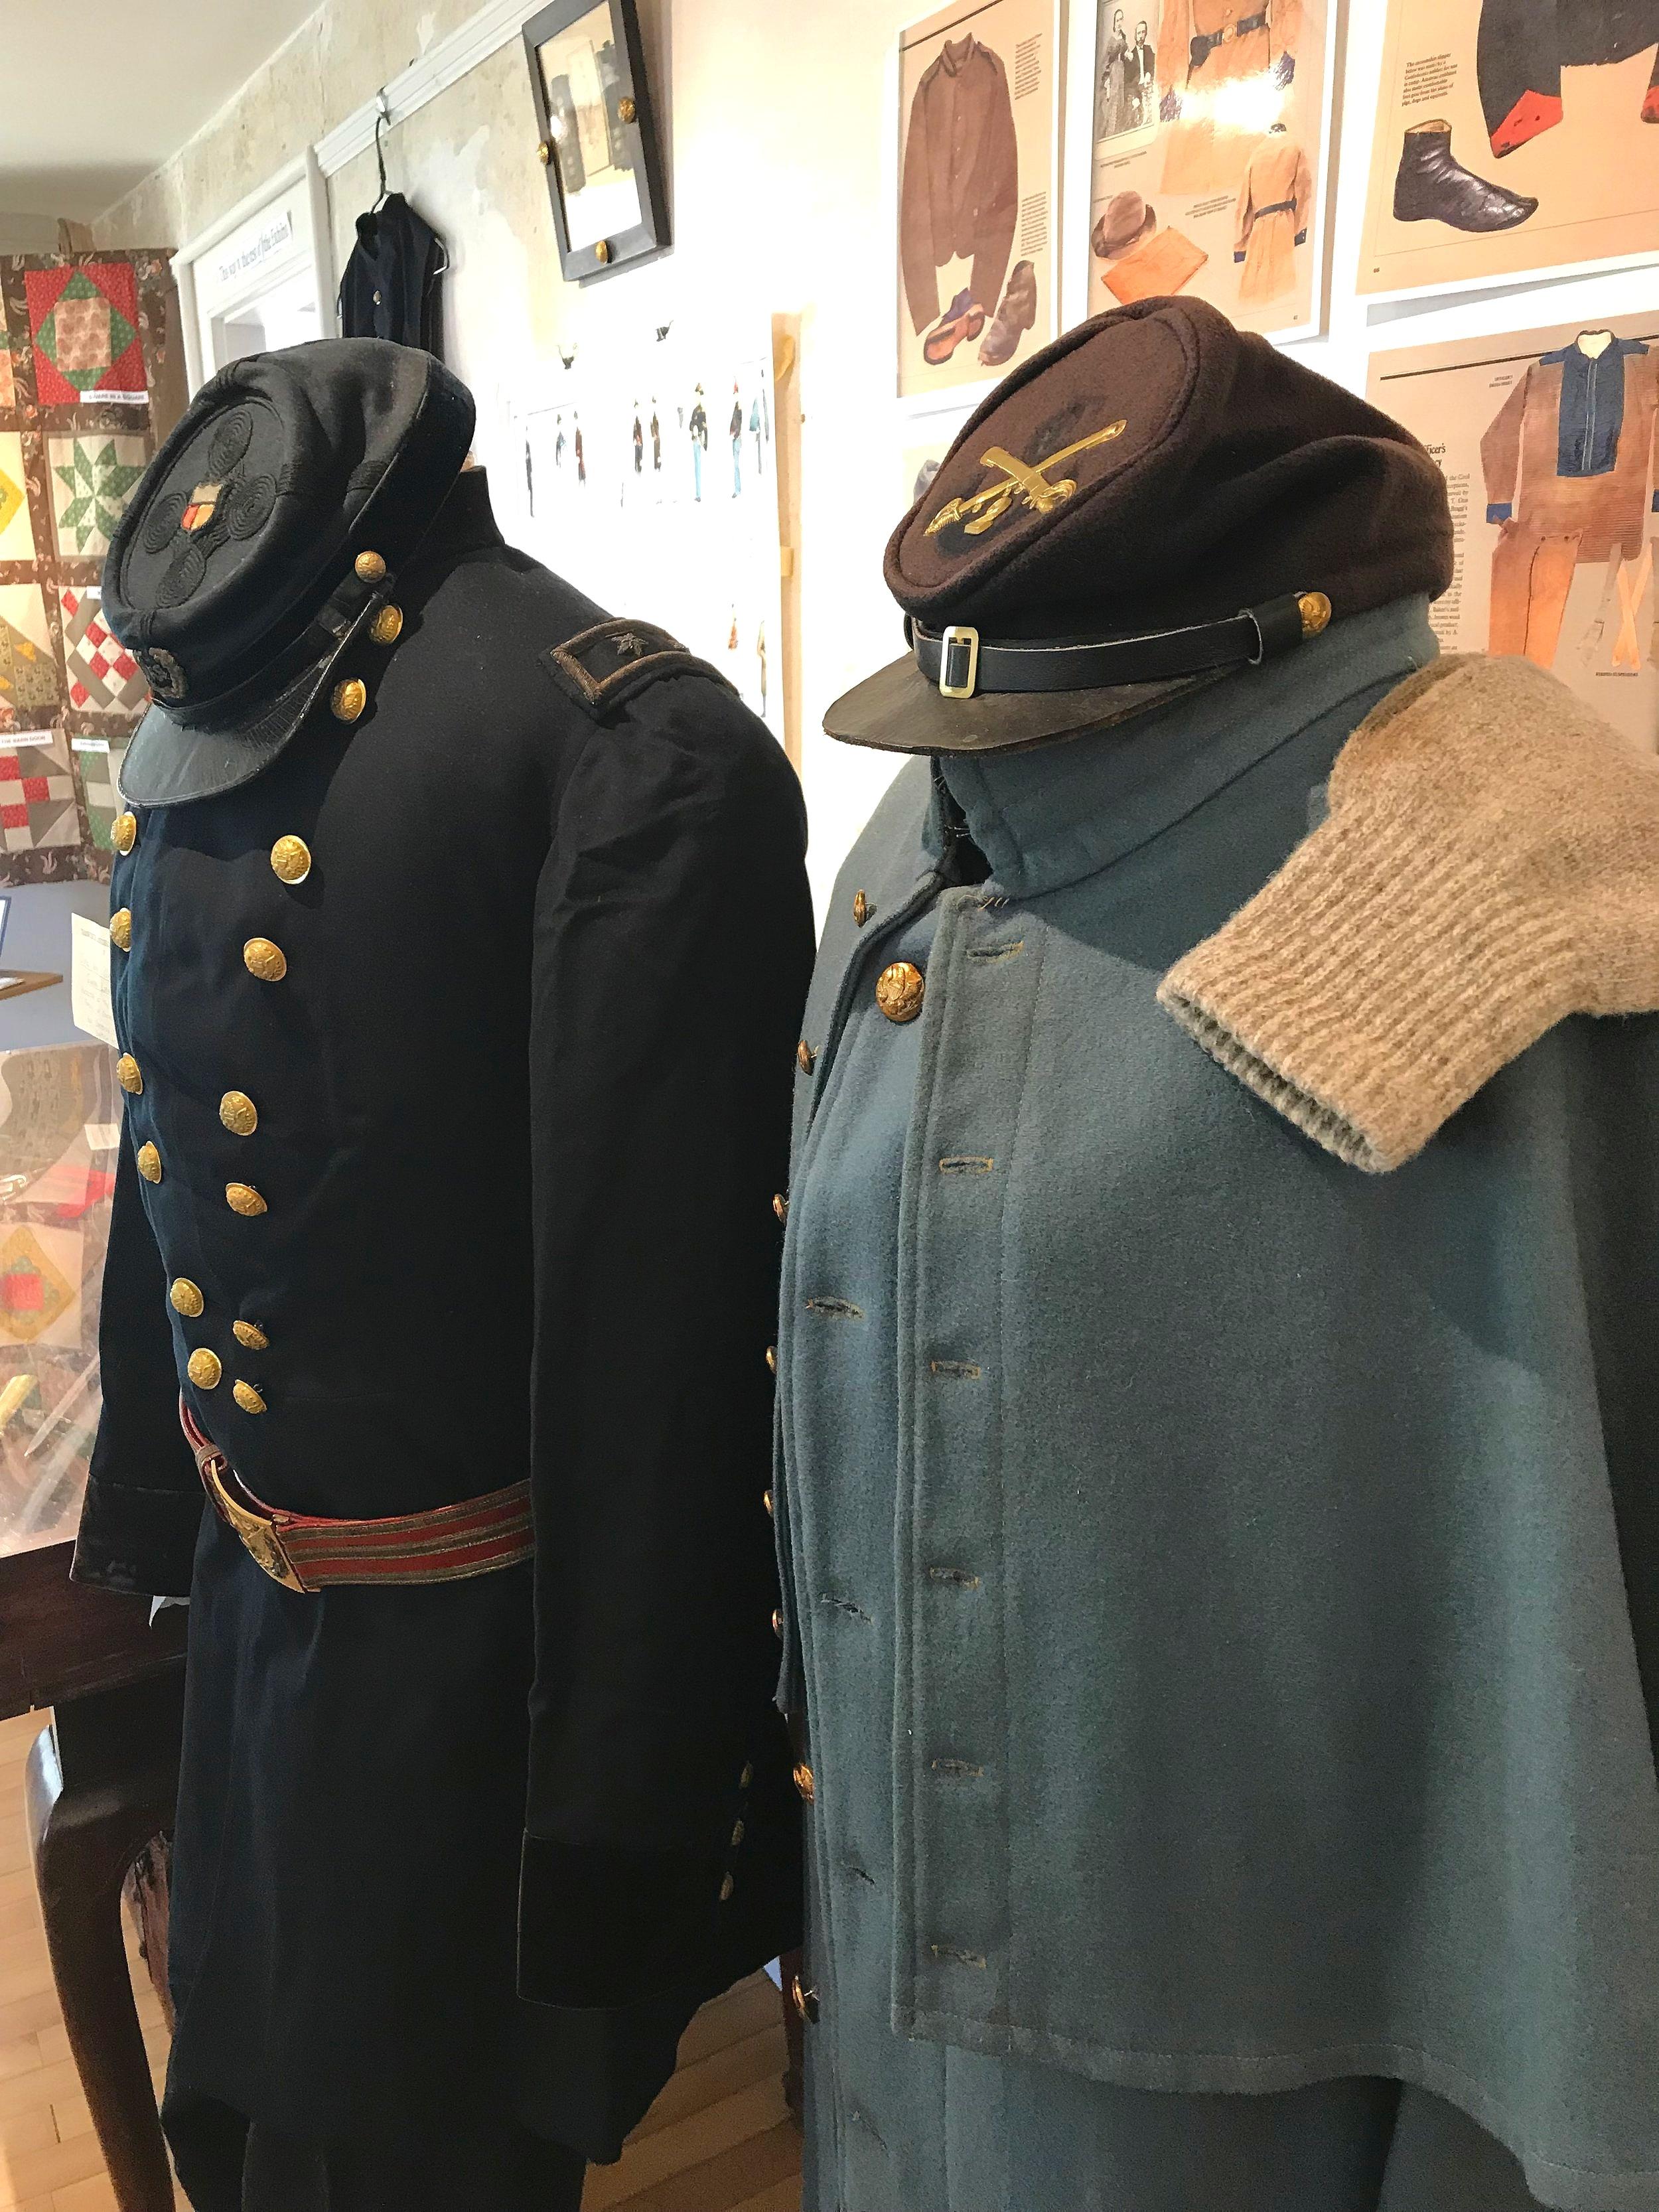 Civil War uniforms in the exhibit.